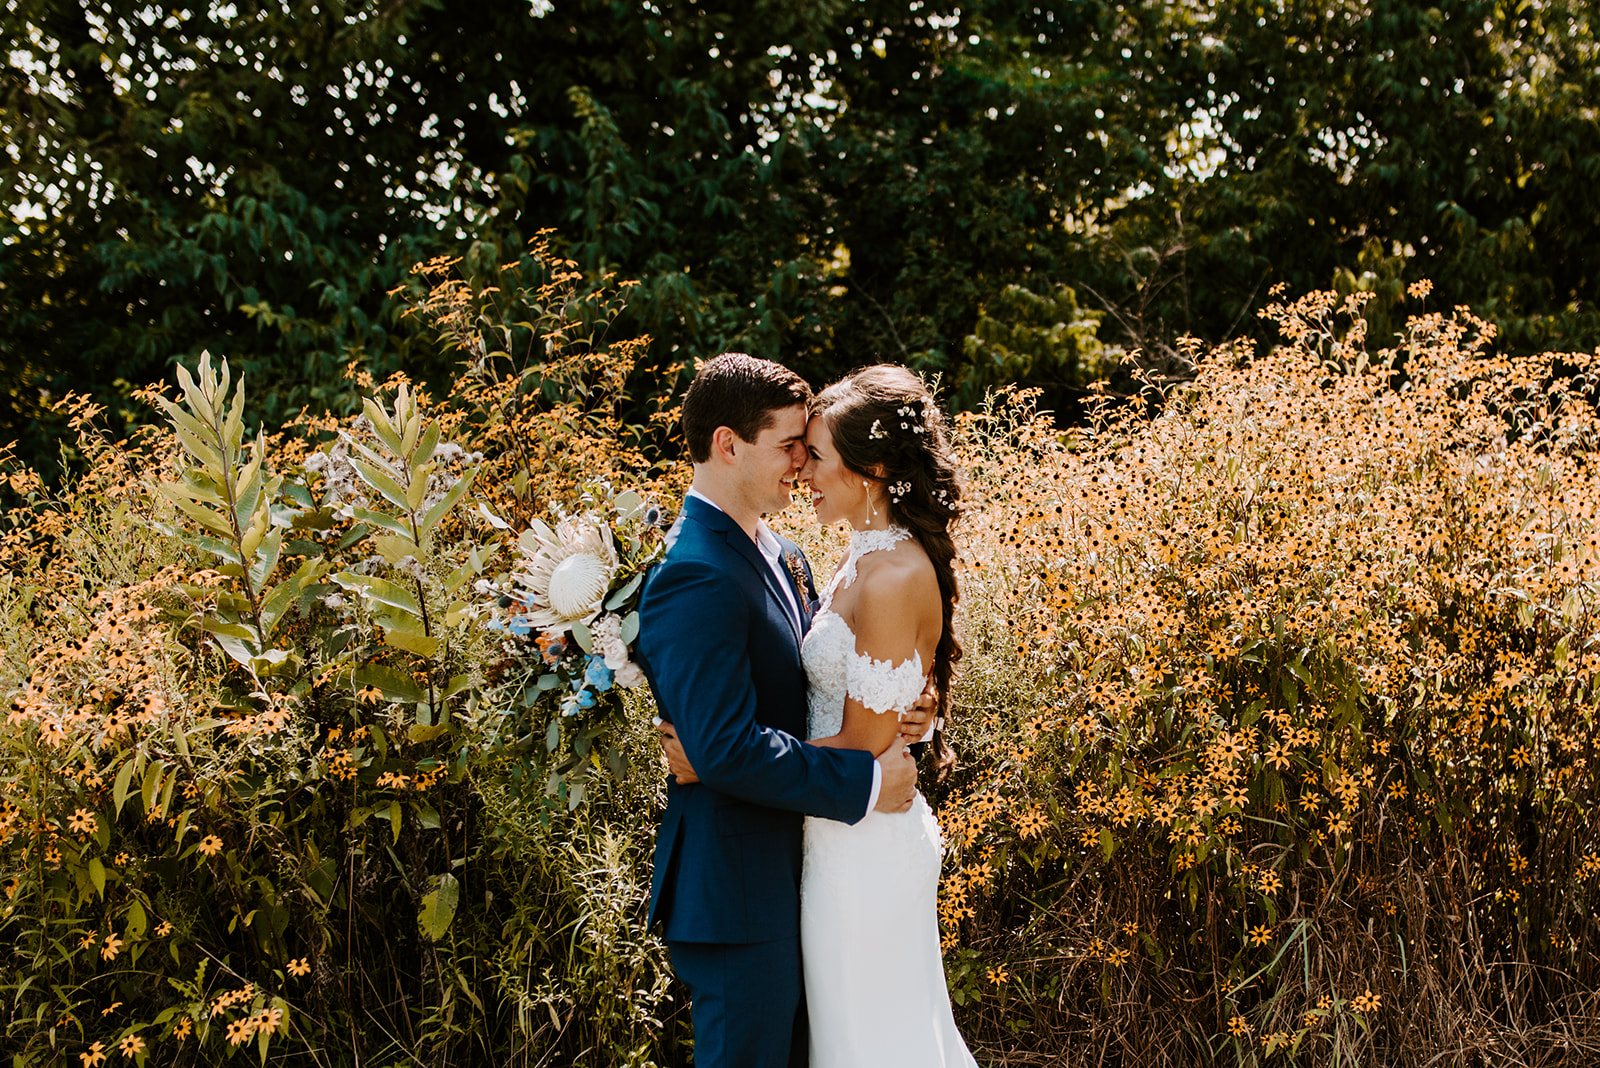 Kaitlin + Conner // wedding